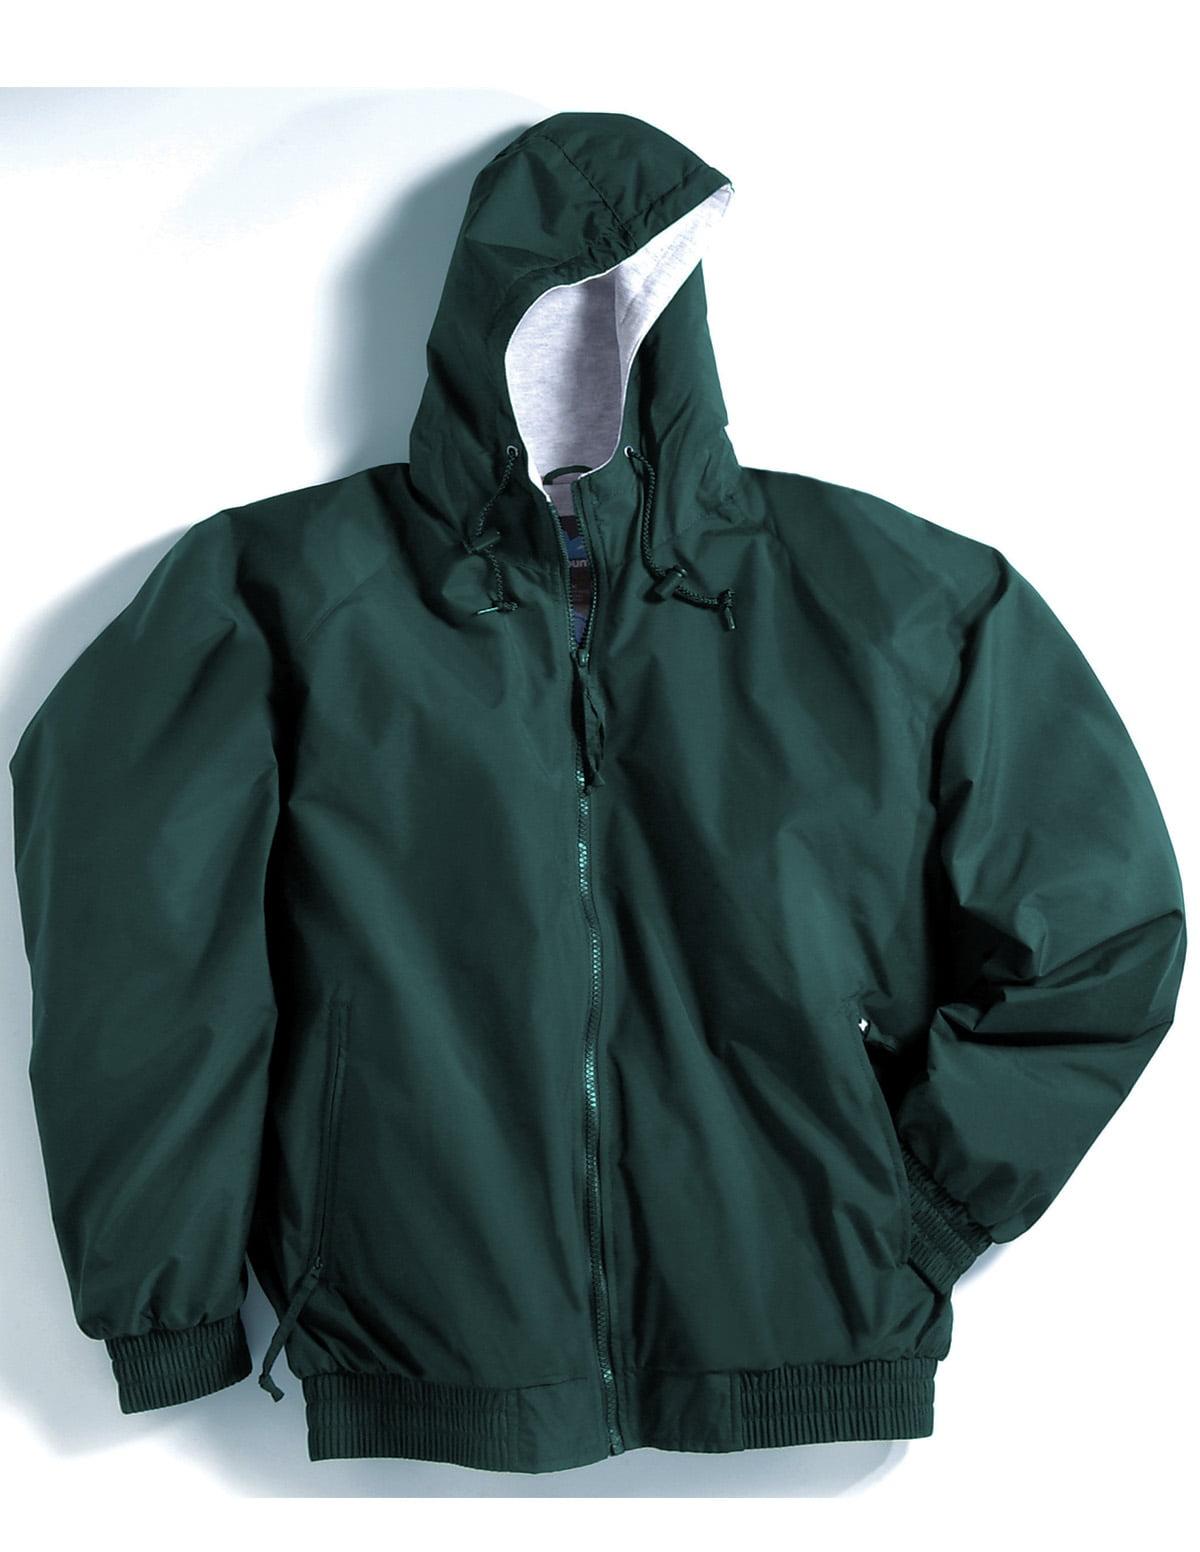 Tri-Mountain Bay Watch 3600 Nylon hooded jacket, 2X-Large, Black